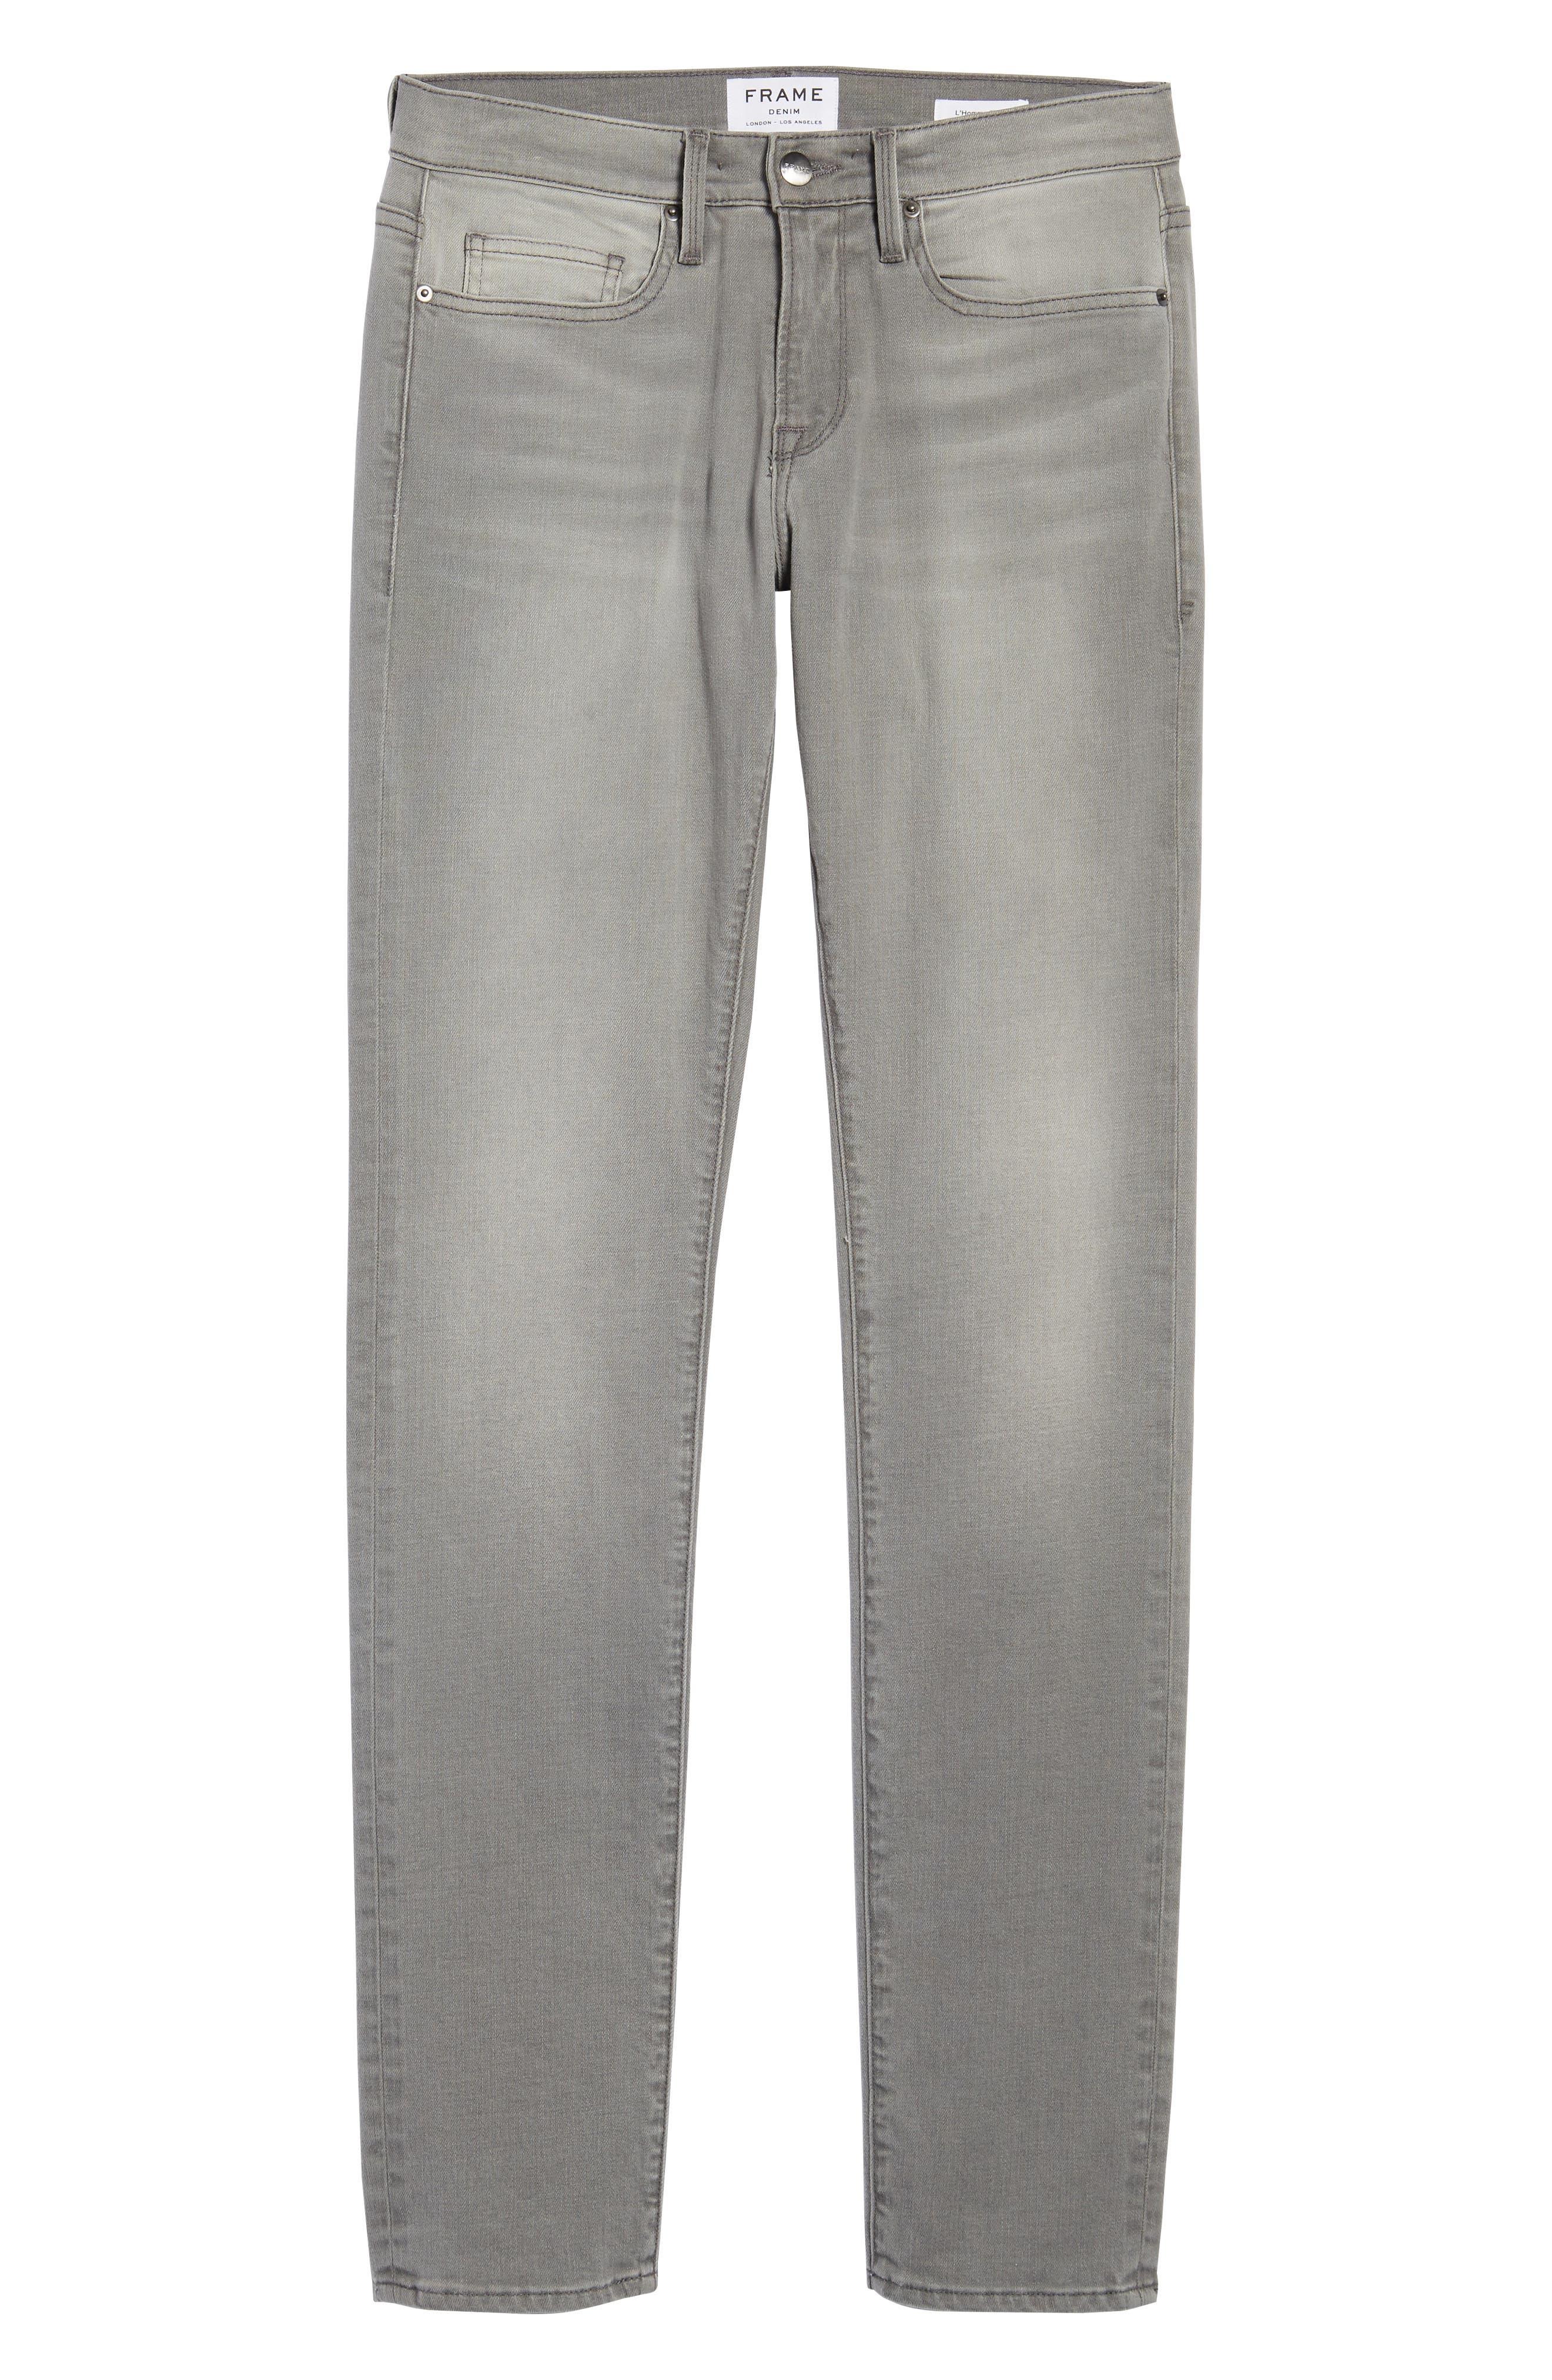 FRAME,                             L'Homme Slim Fit Jeans,                             Alternate thumbnail 6, color,                             031